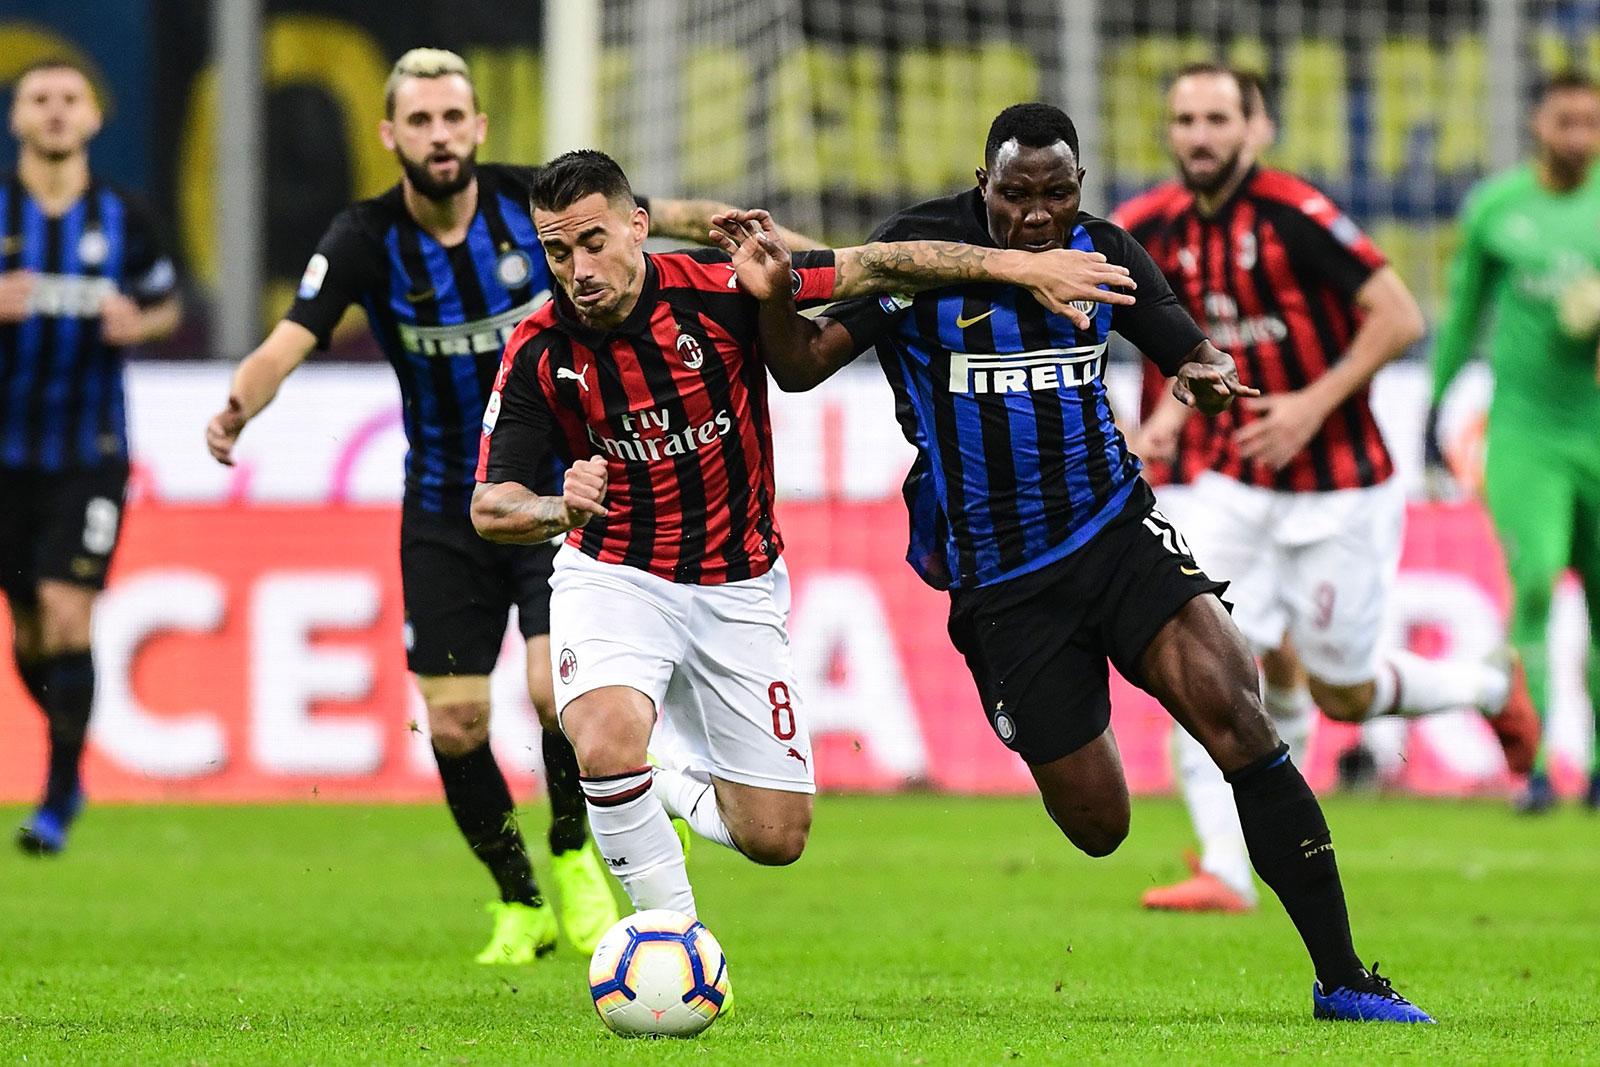 Suso and Kwadwo Asamoah during Inter-Milan at Stadio San Siro on October 21, 2018. (MIGUEL MEDINA/AFP/Getty Images)